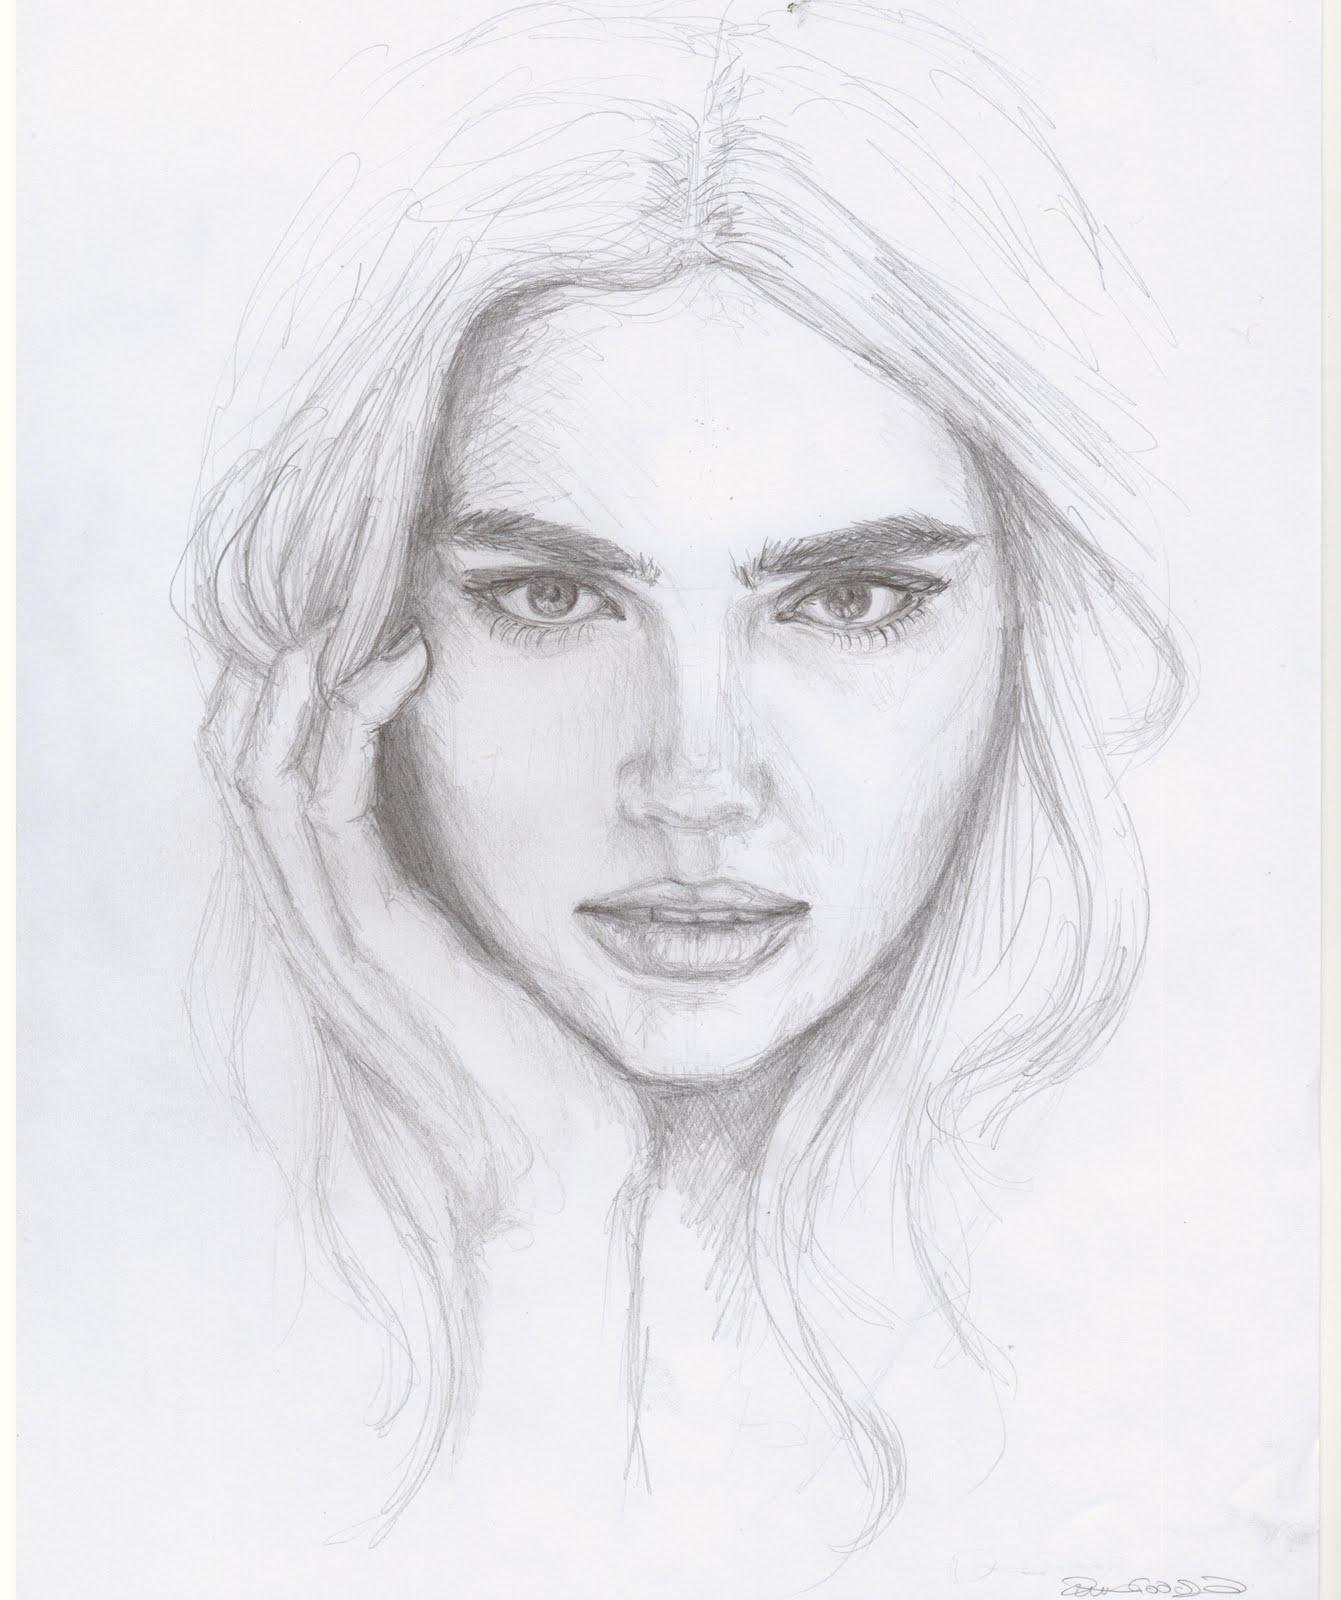 Human Face Sketch National Art Society